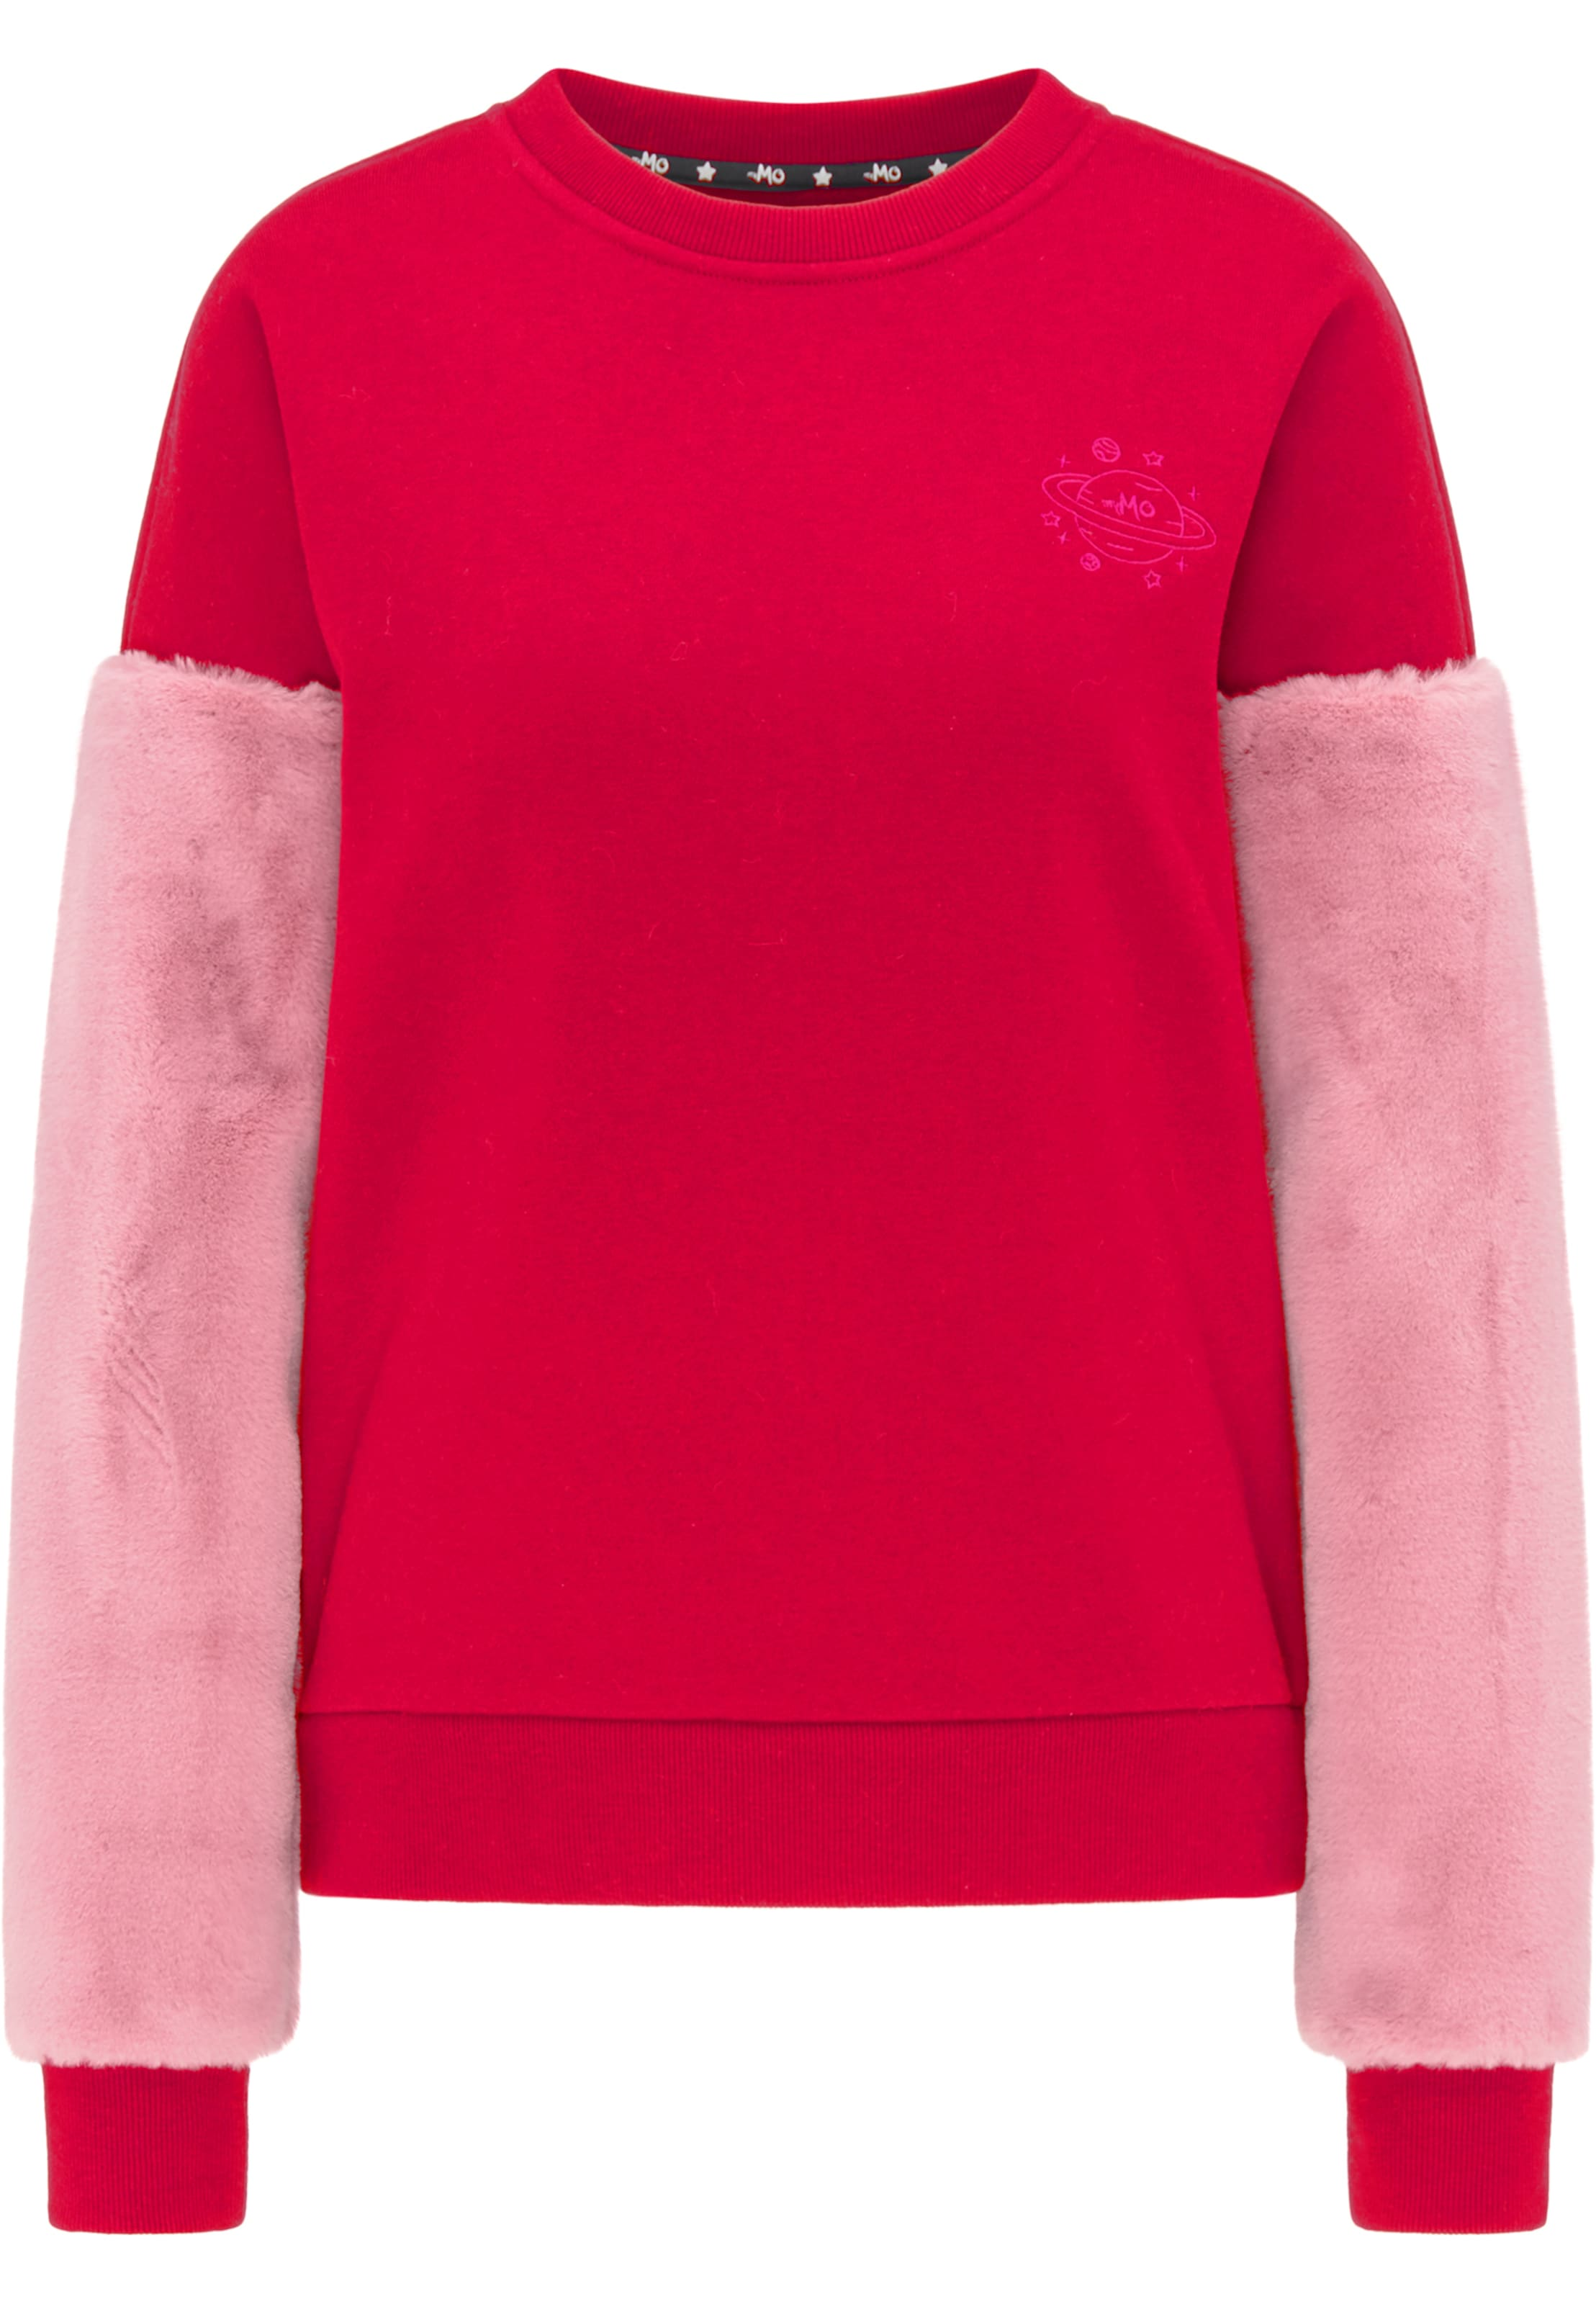 shirt En RoseRouge Sweat Mymo q54RAL3j